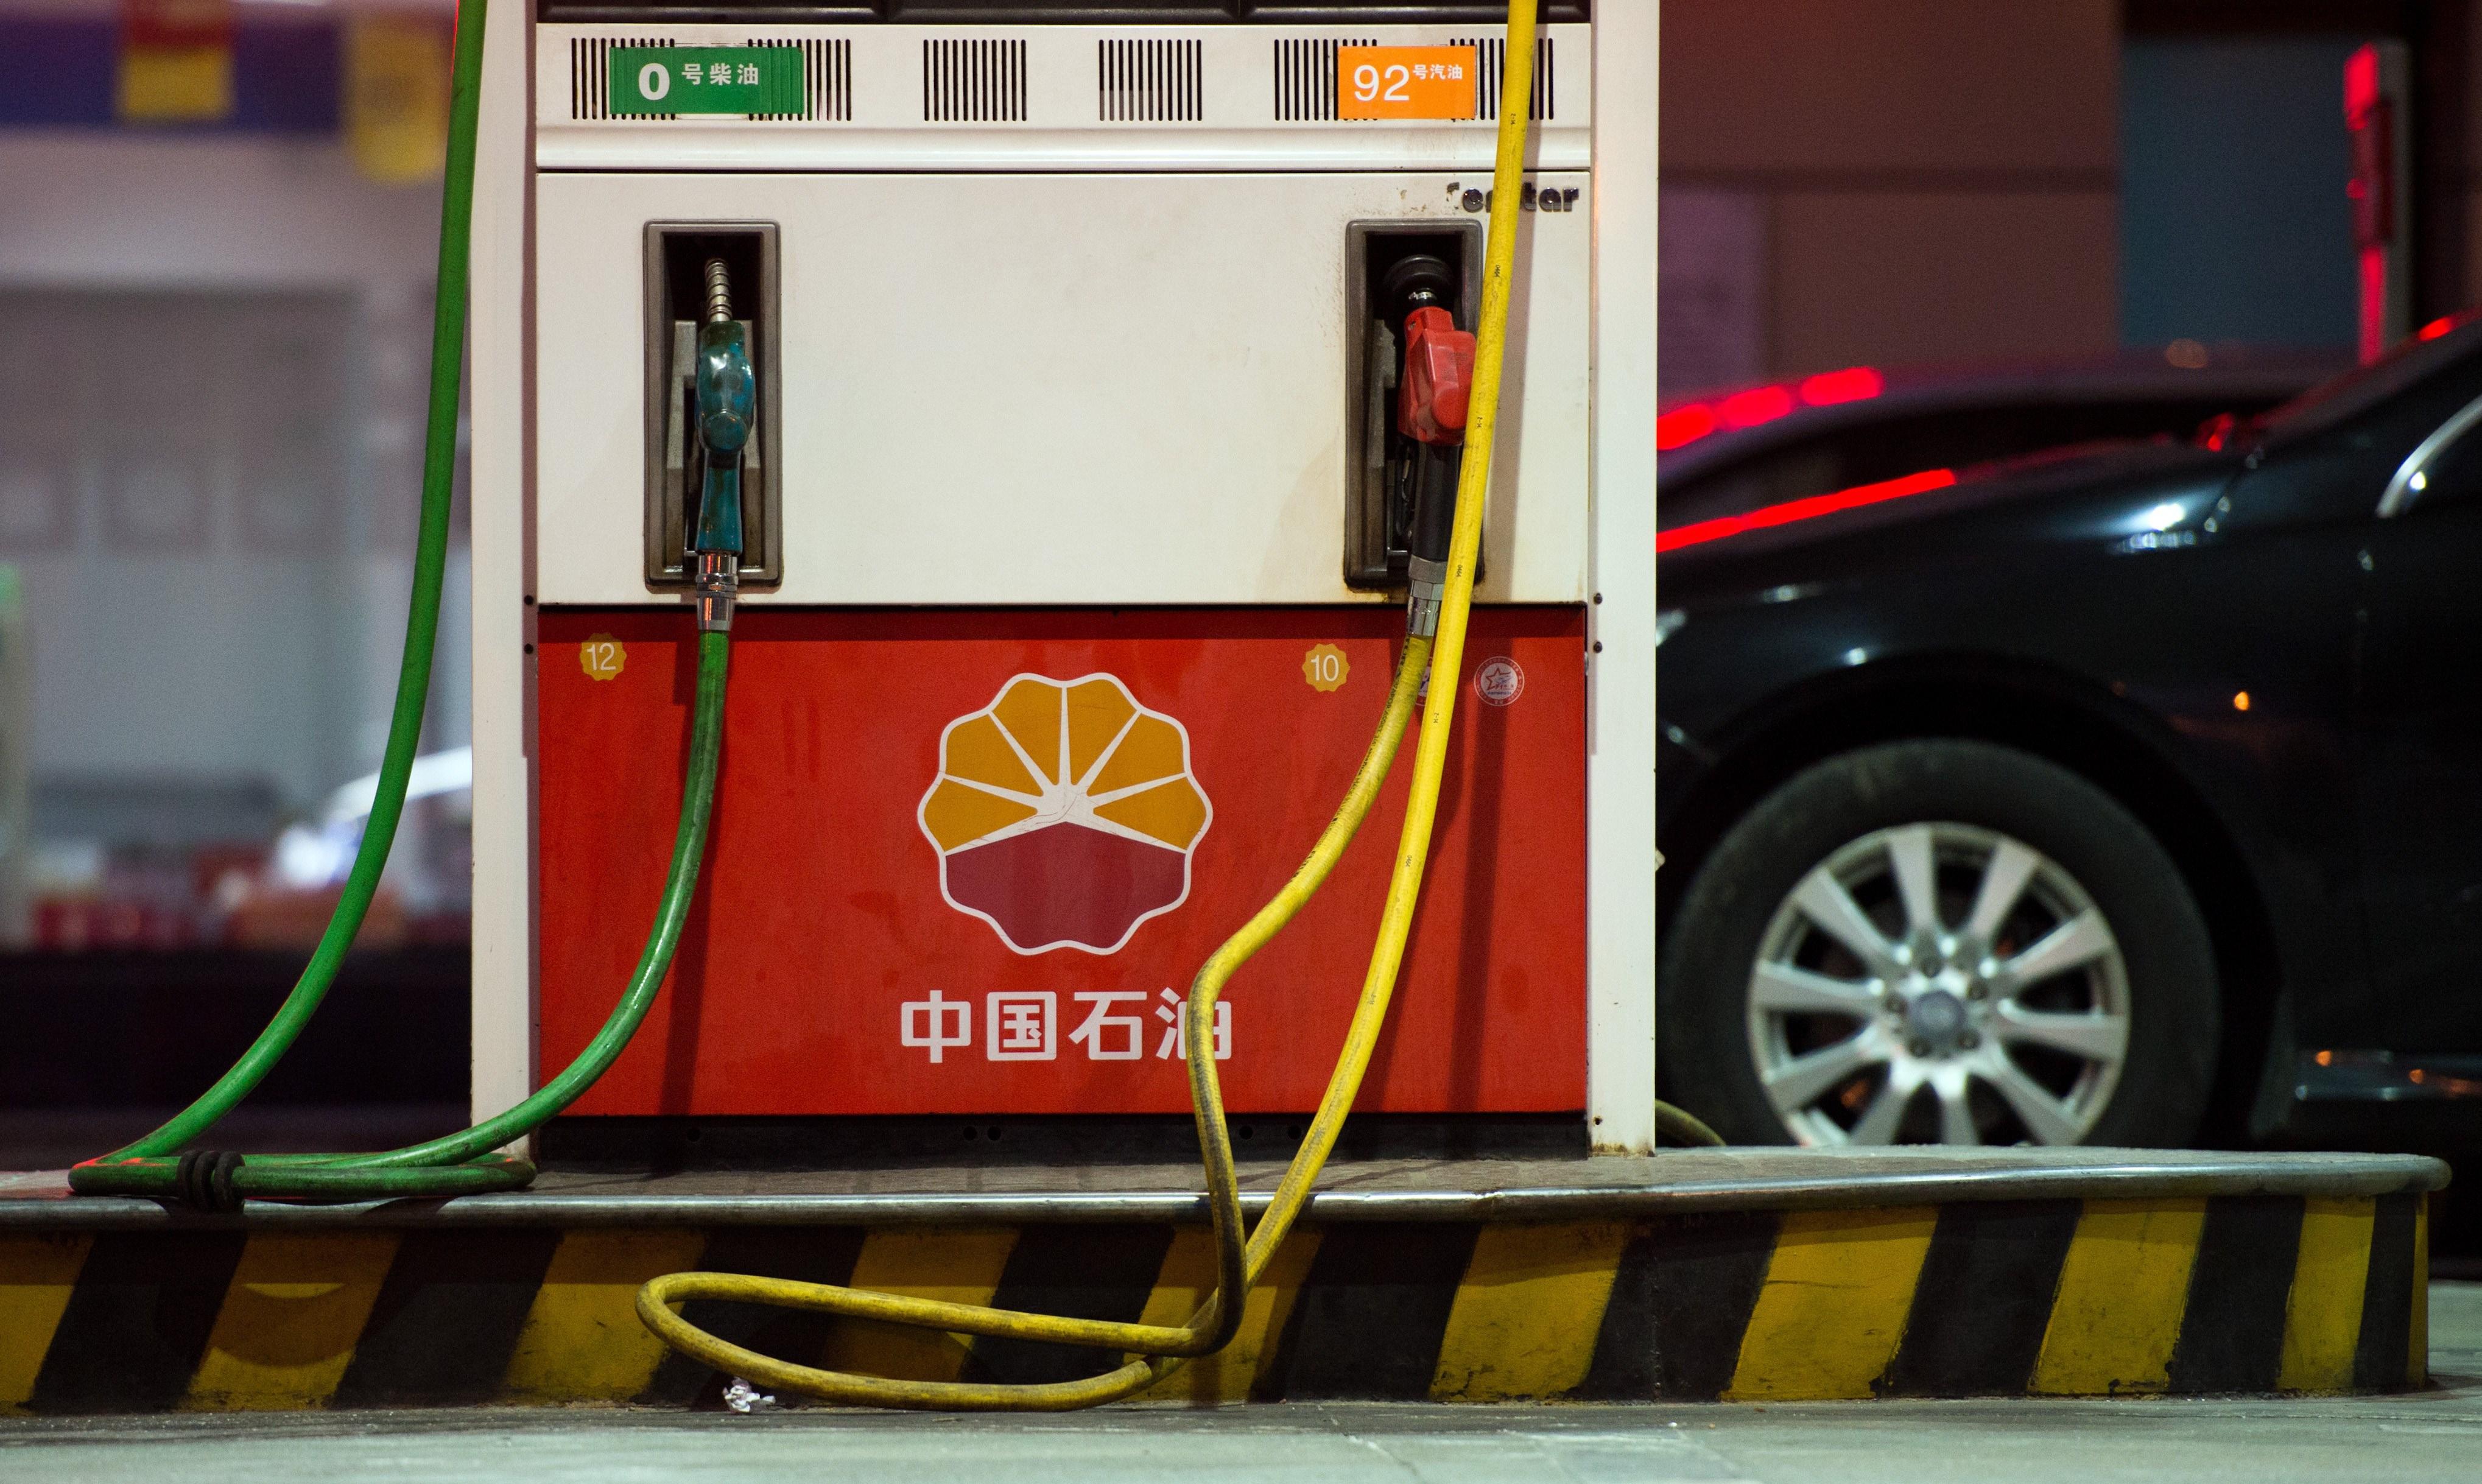 A PetroChina petrol station in Shanghai.